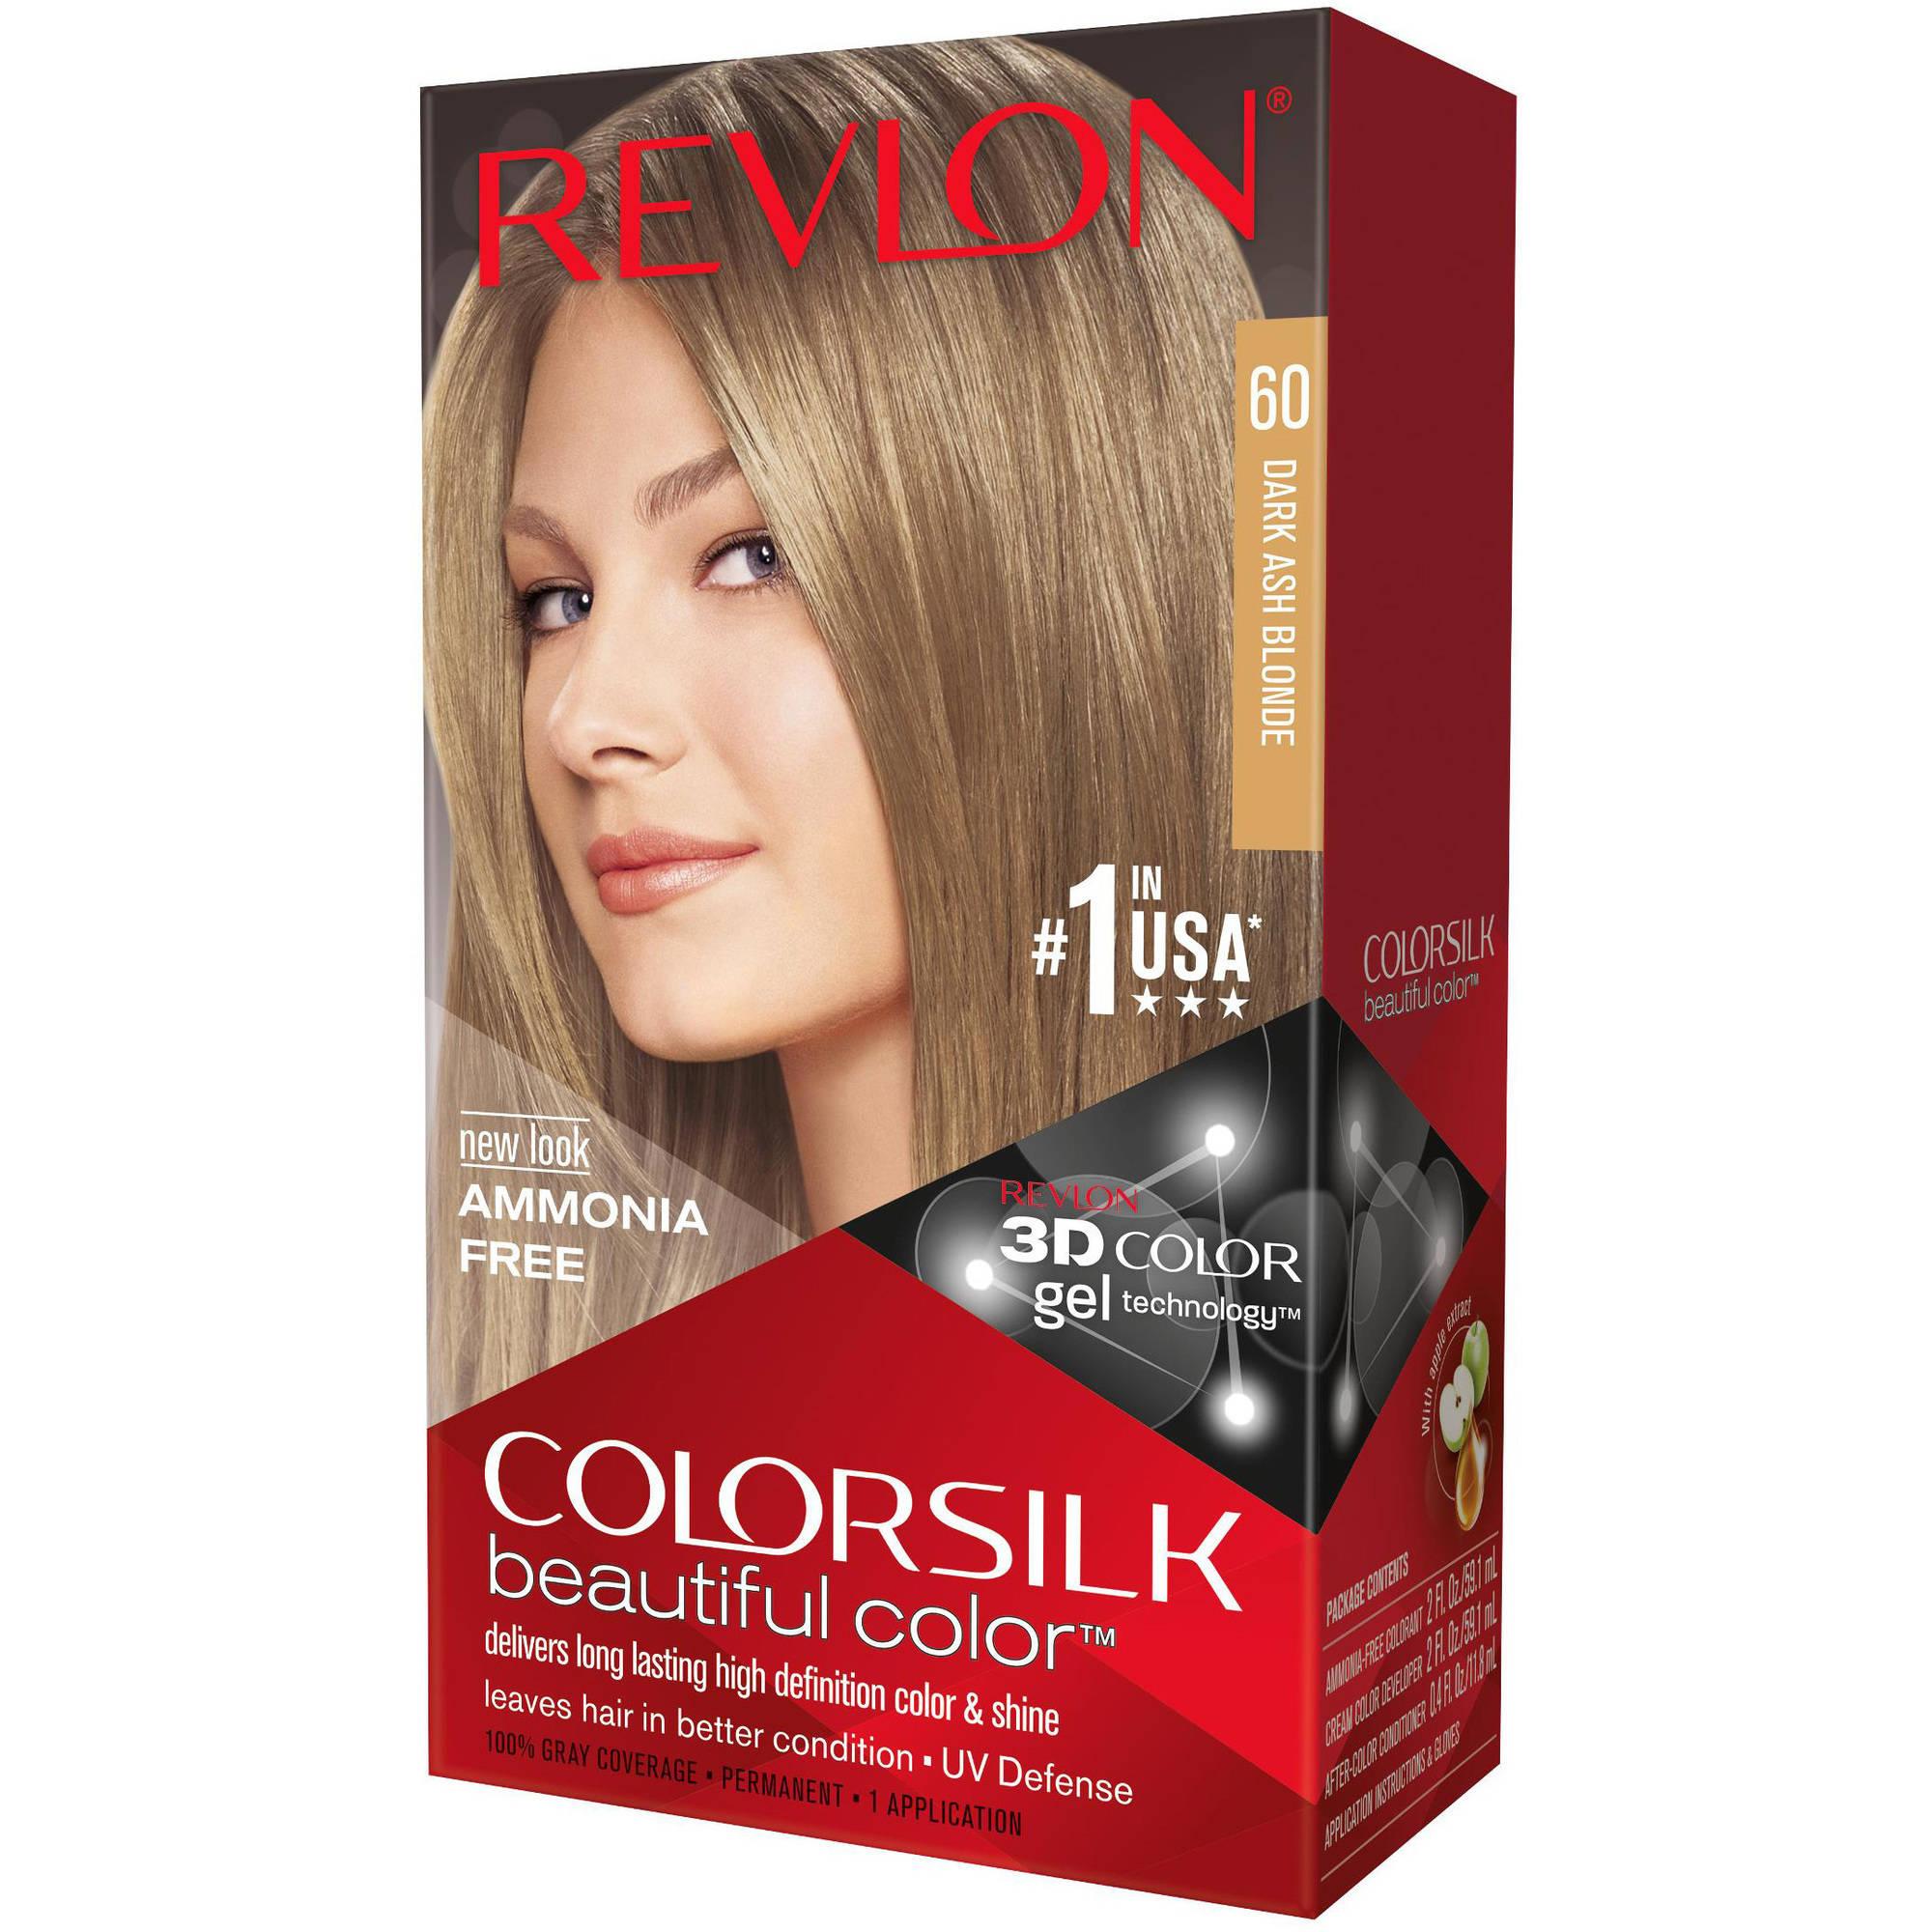 Revlon Colorsilk Beautiful Color Permanent Hair Color, 60 Dark Ash Blonde